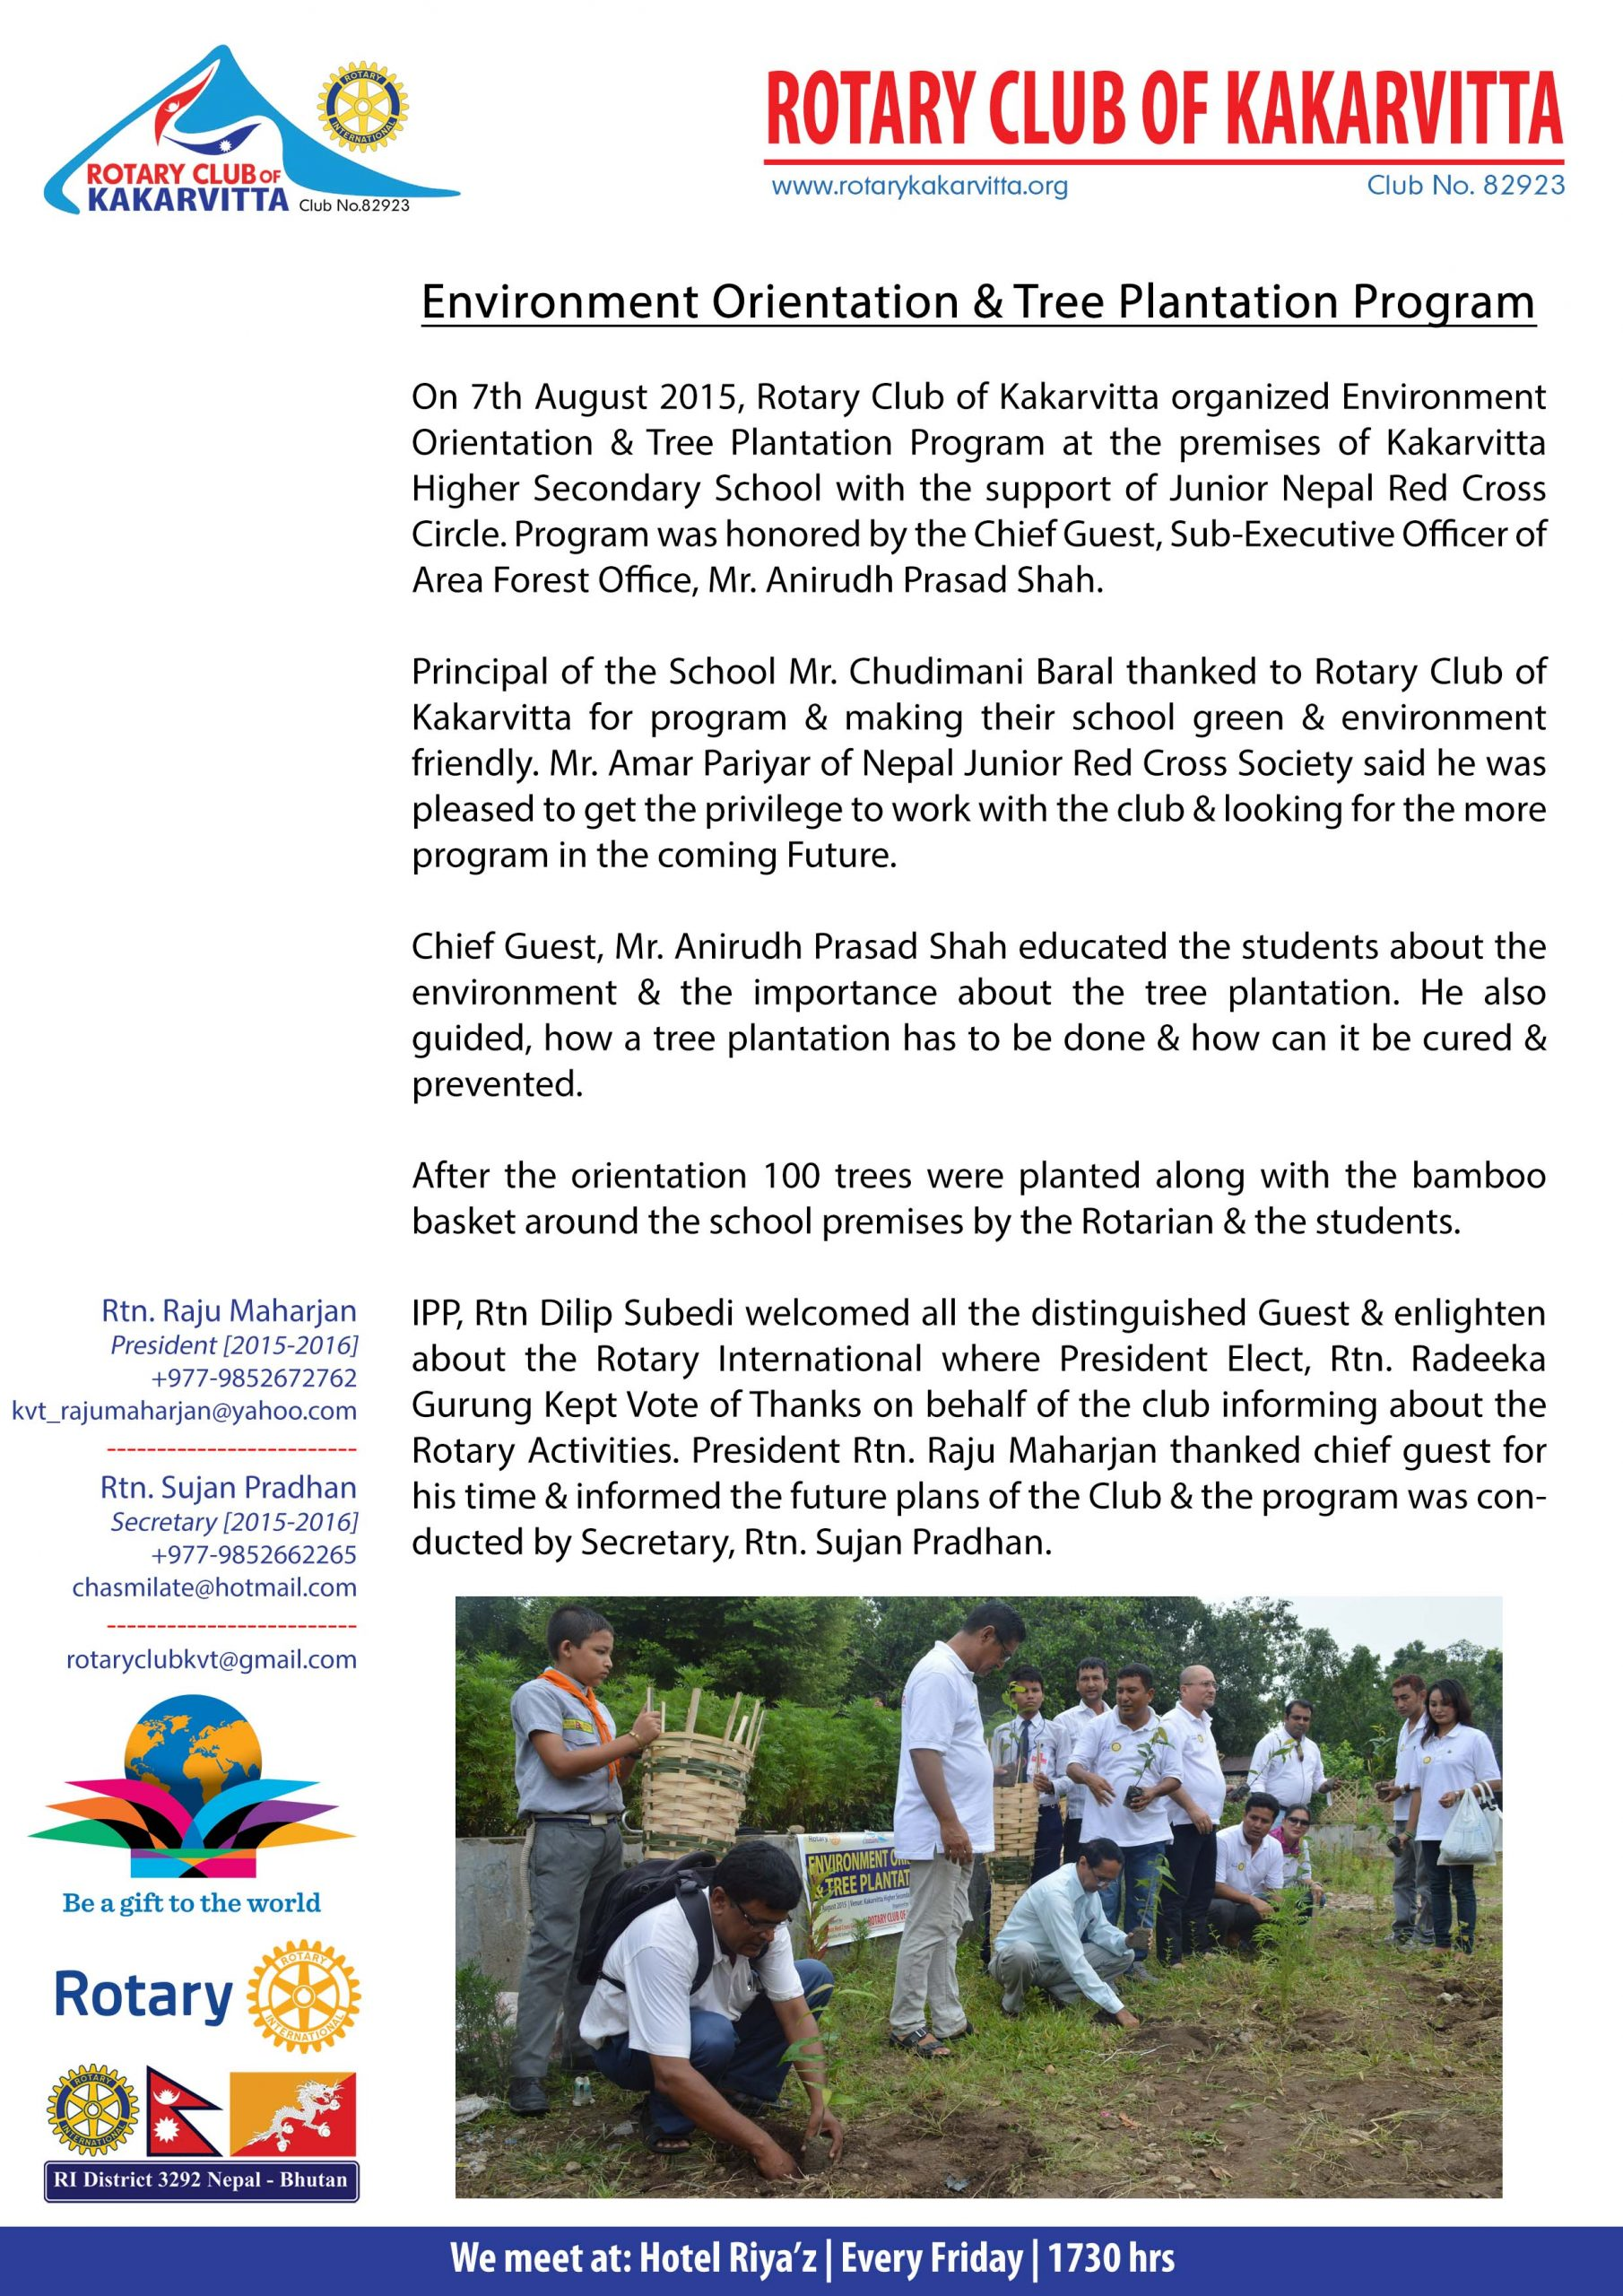 Enviroment Orientation Tree Plantation Rotary Club Of Kakarvitta 0